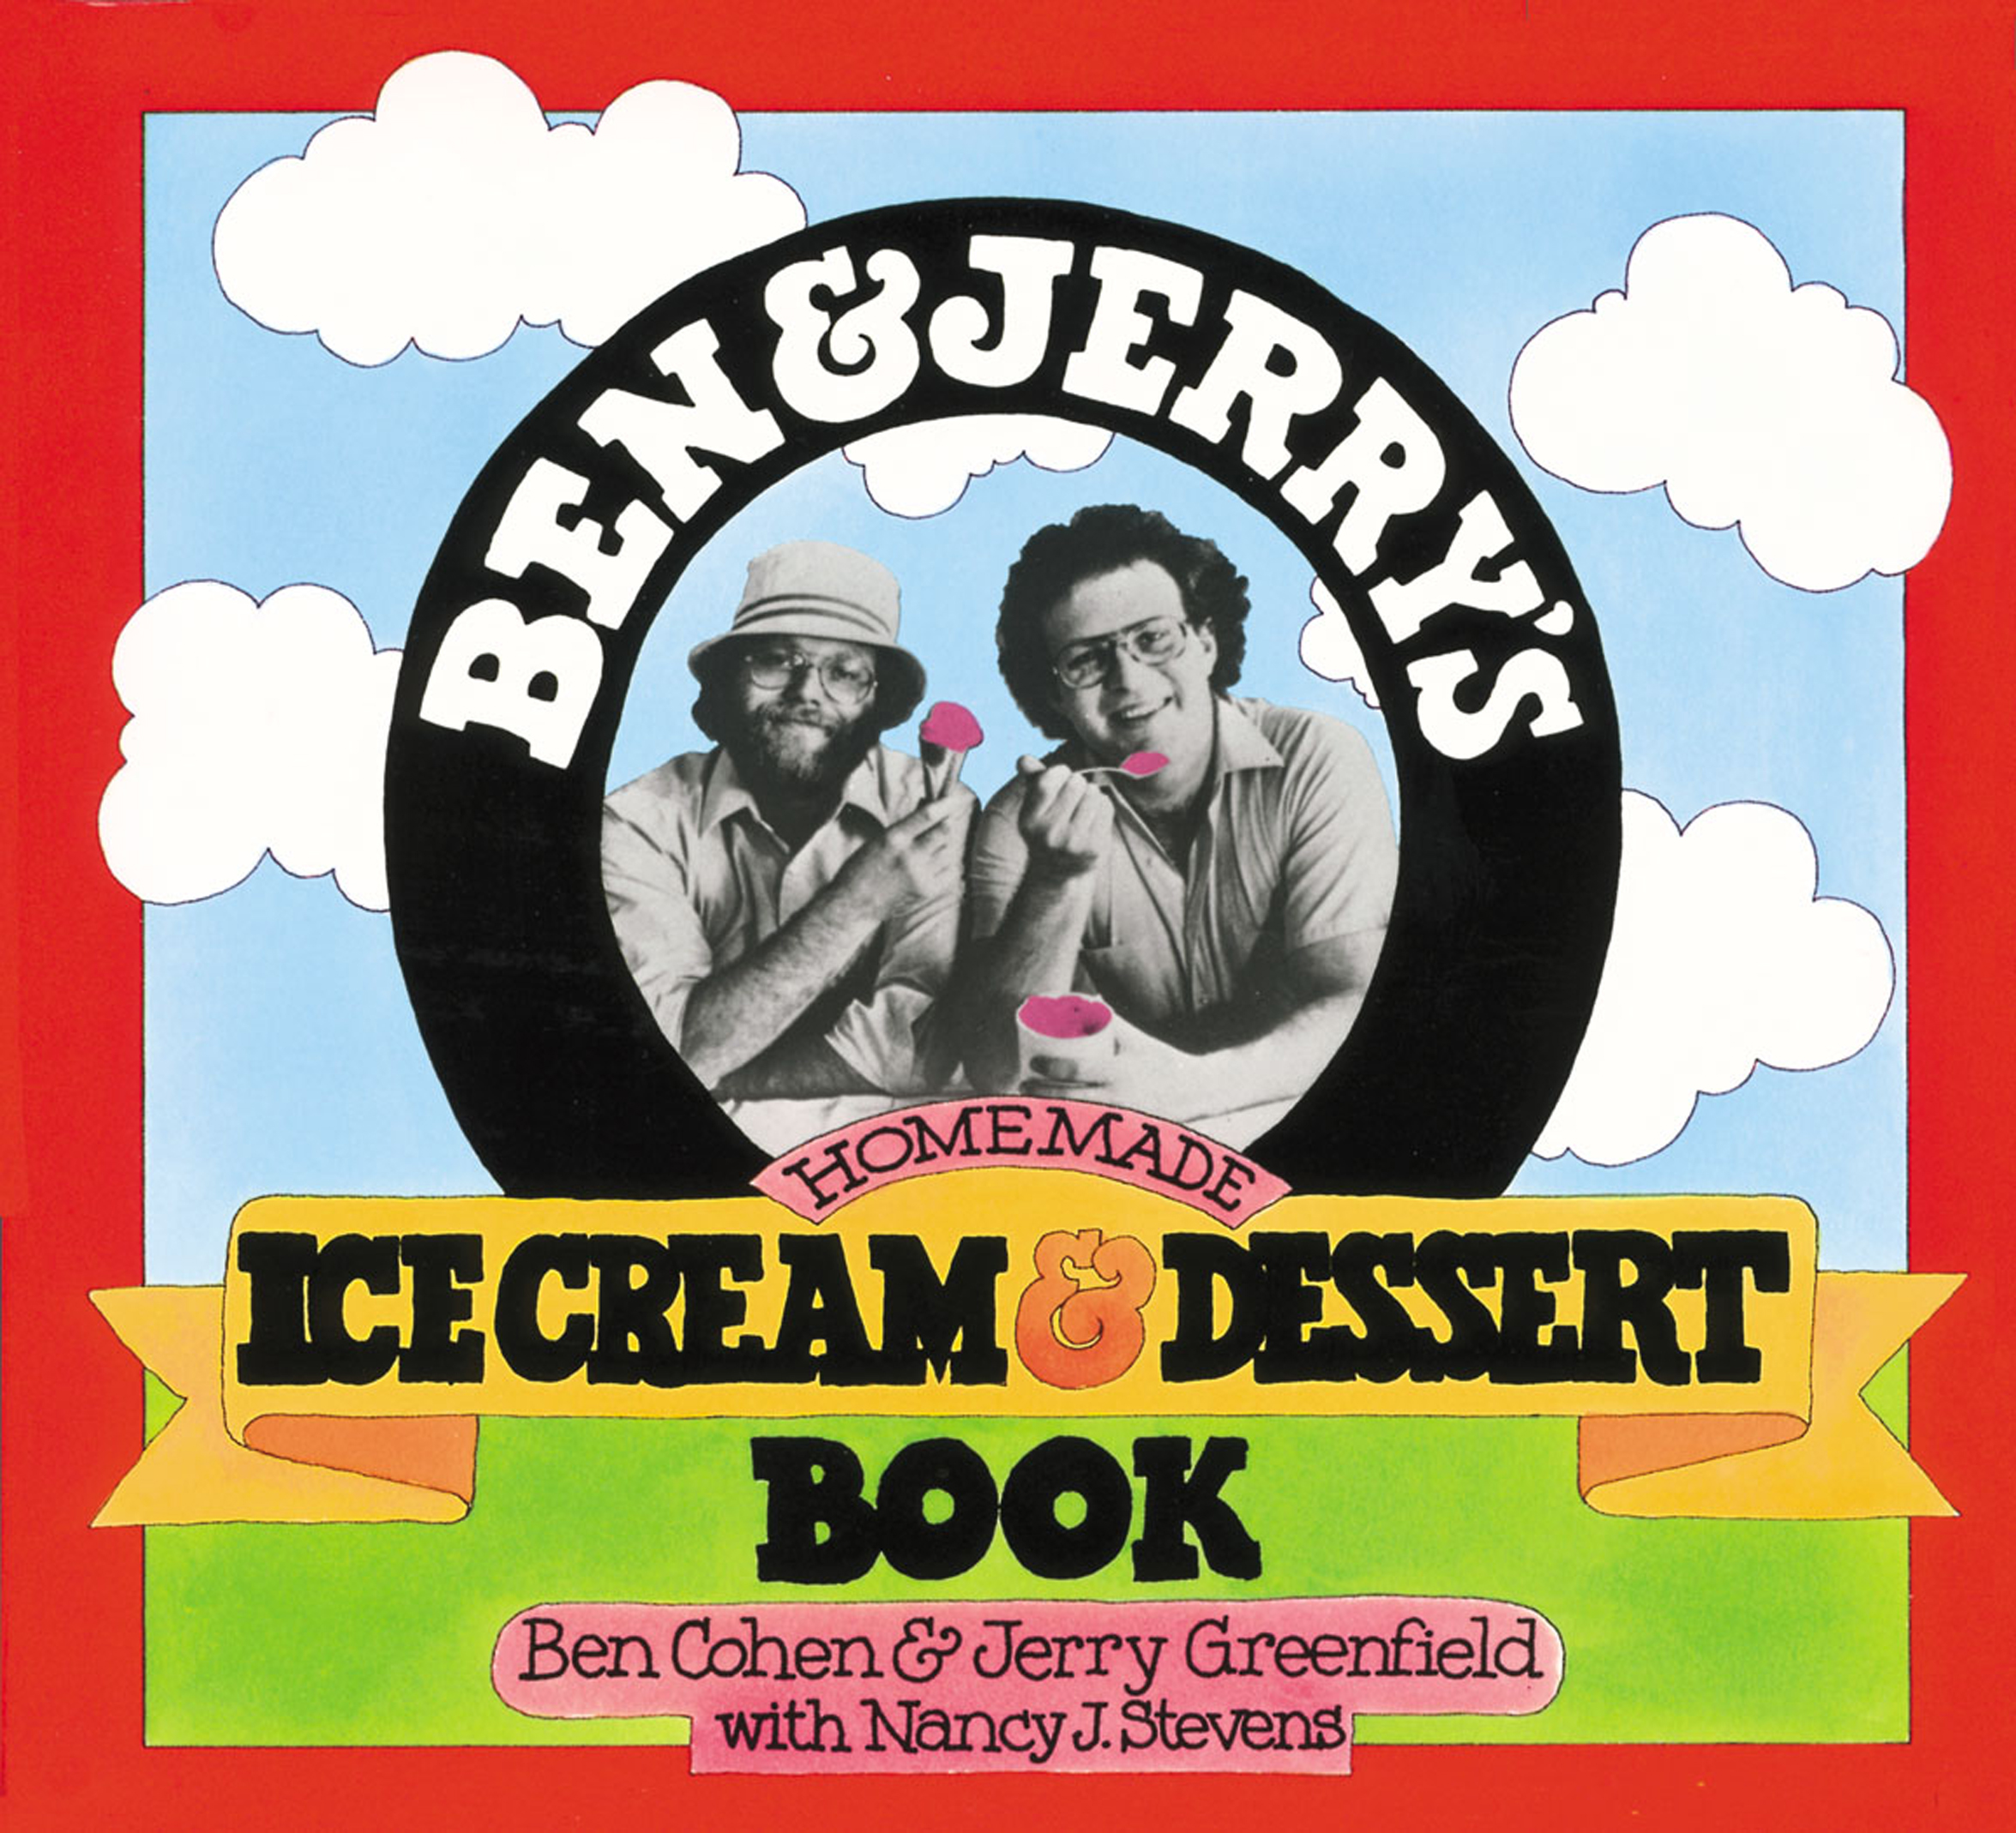 Ben & Jerry's Homemade Ice Cream & Dessert Book - Paperback